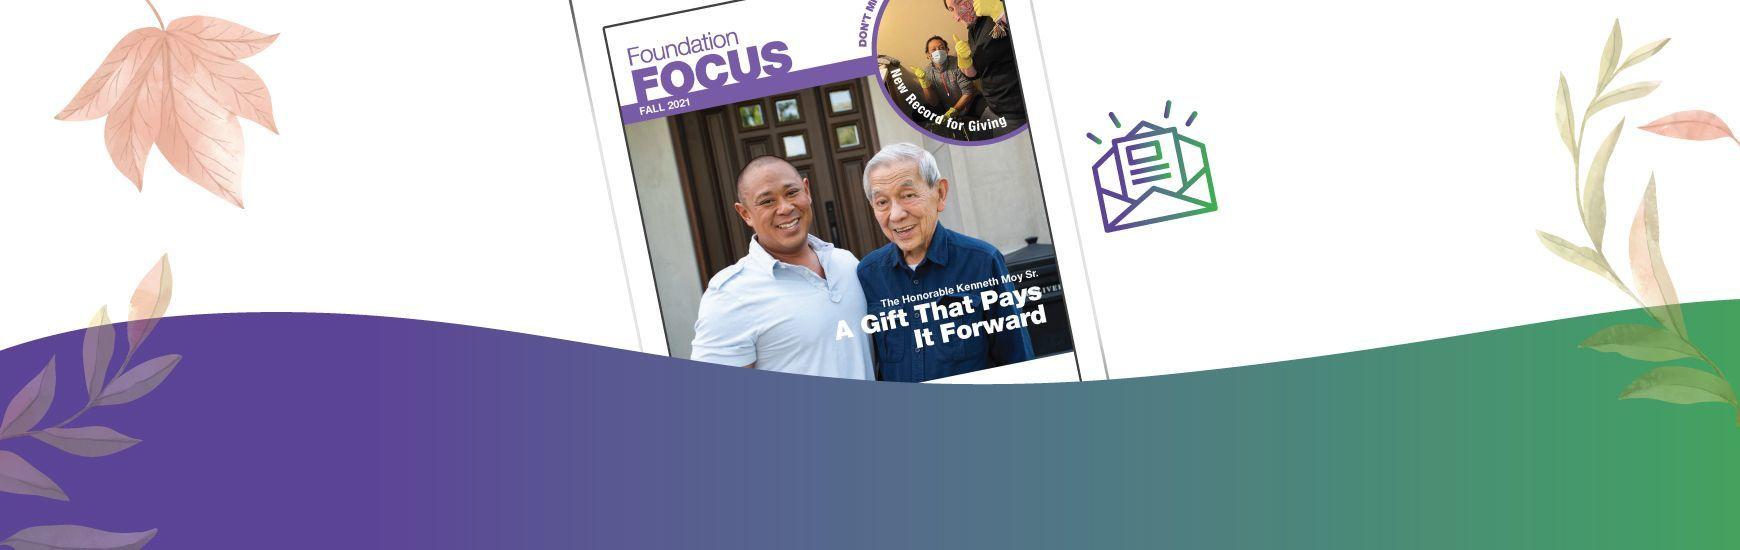 Fall 2021 Foundation Focus Newsletter